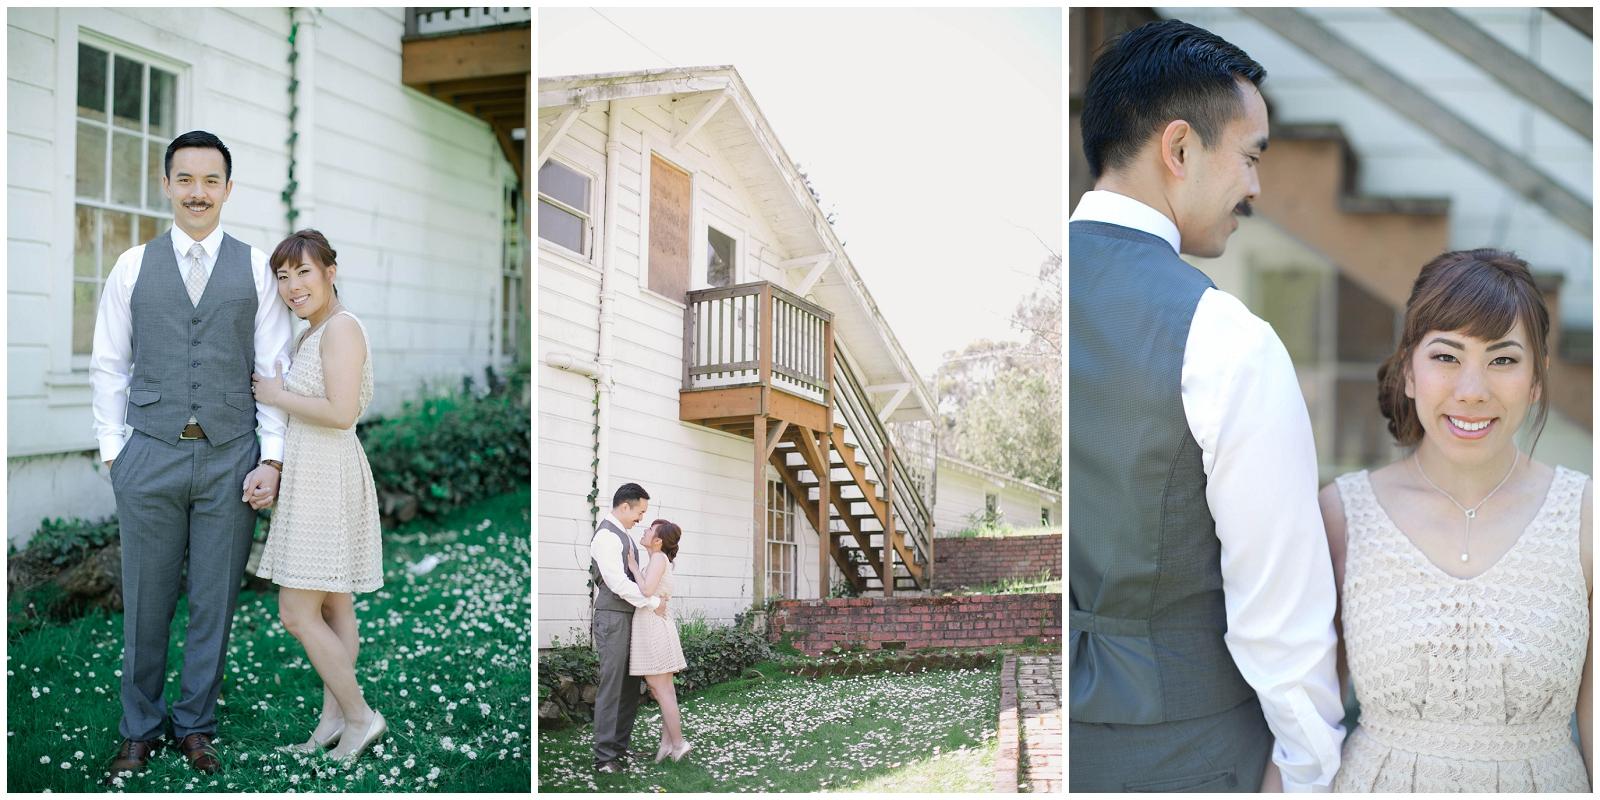 San-Francisco-Bay-Area-Wedding-Photography-Engagement-Treasure-Island-1.jpg